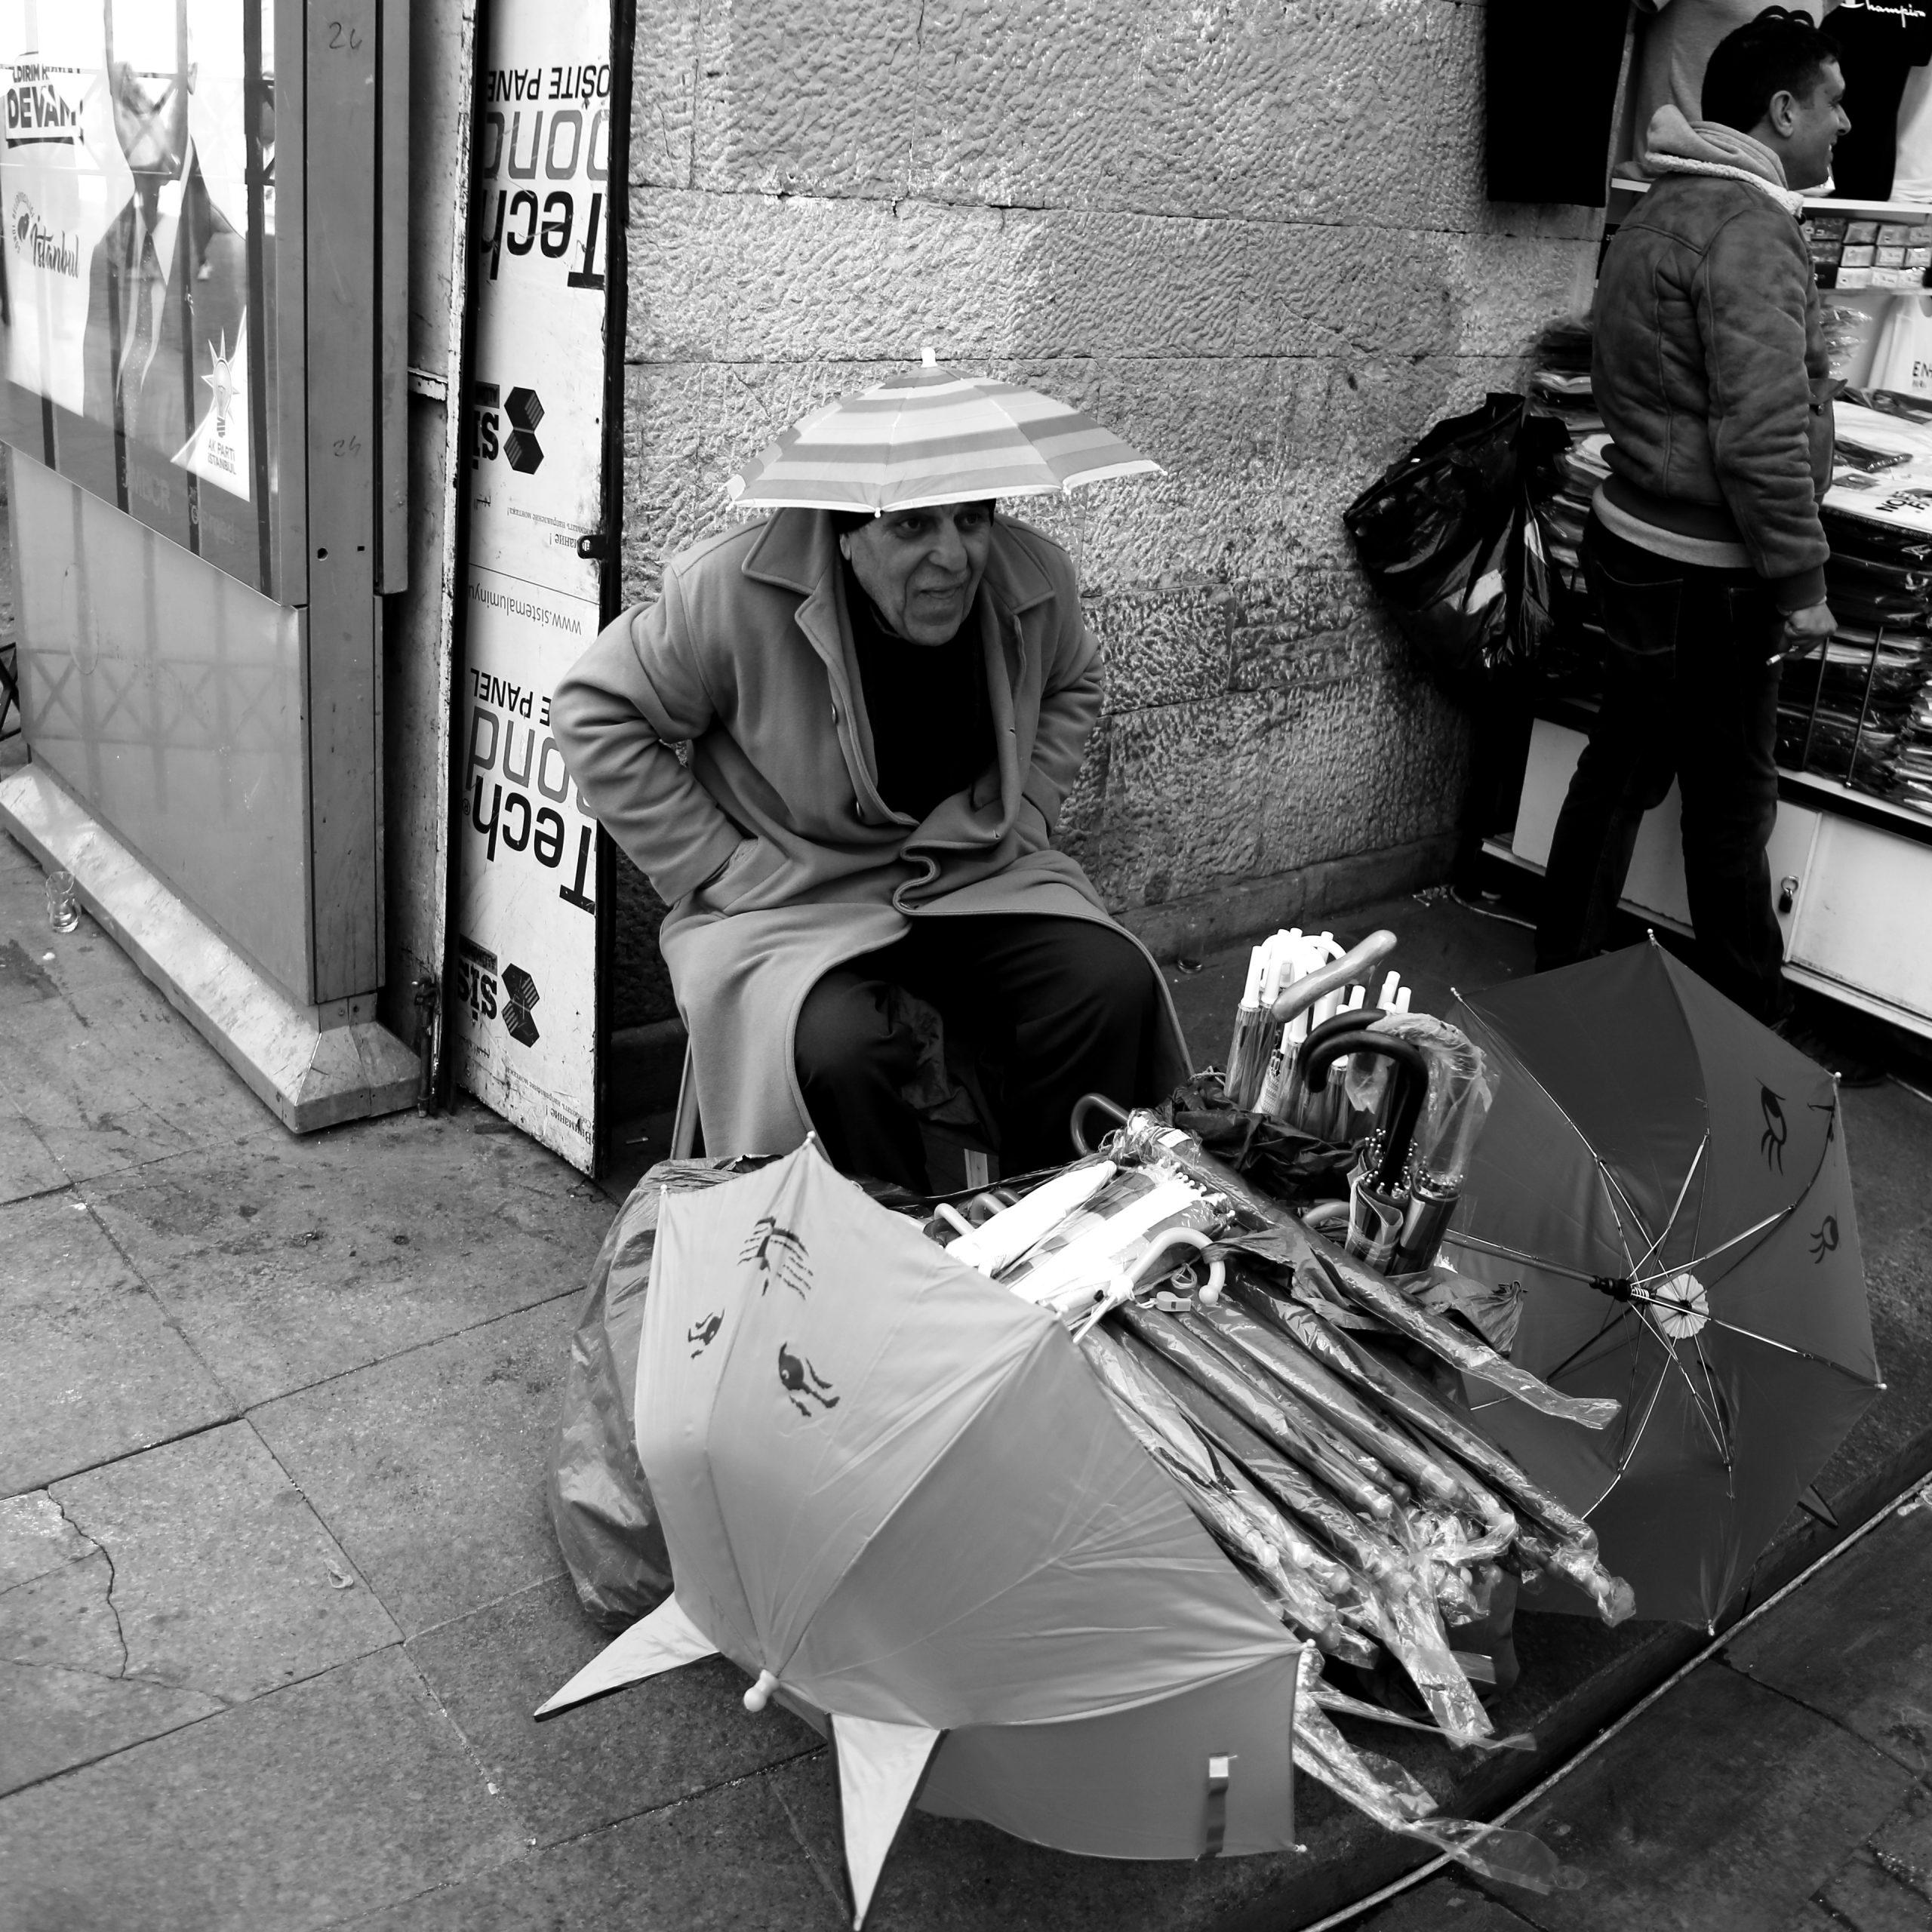 Man selling umbrella in the street